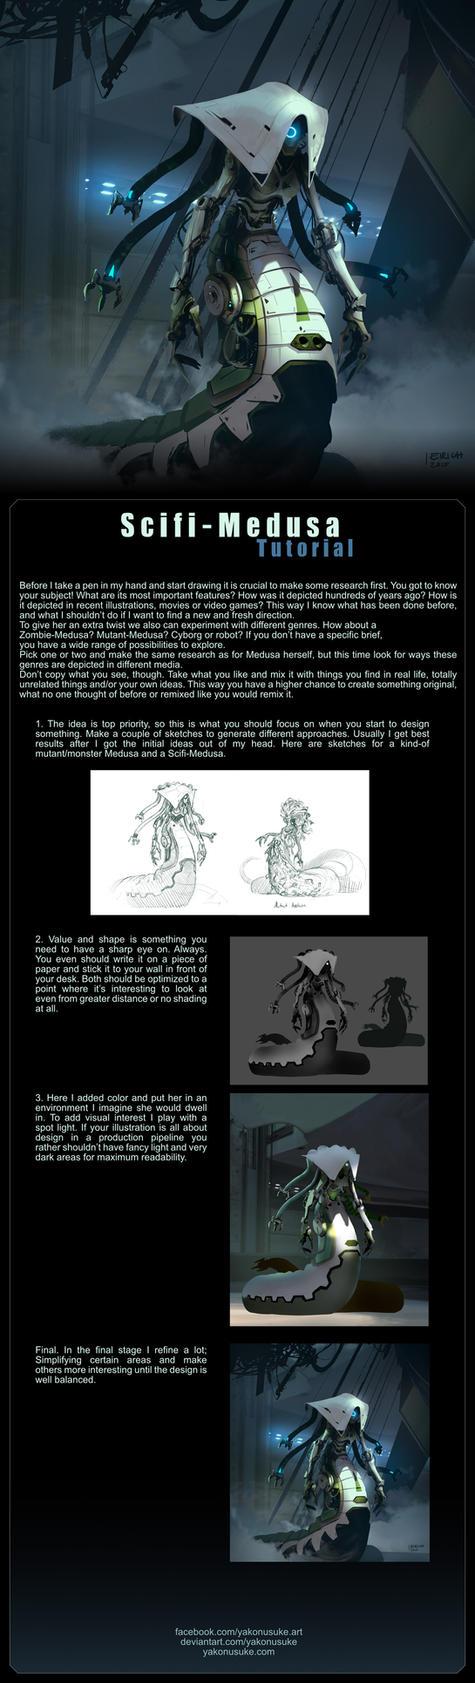 Scifi-Medusa Tutorial by yakonusuke